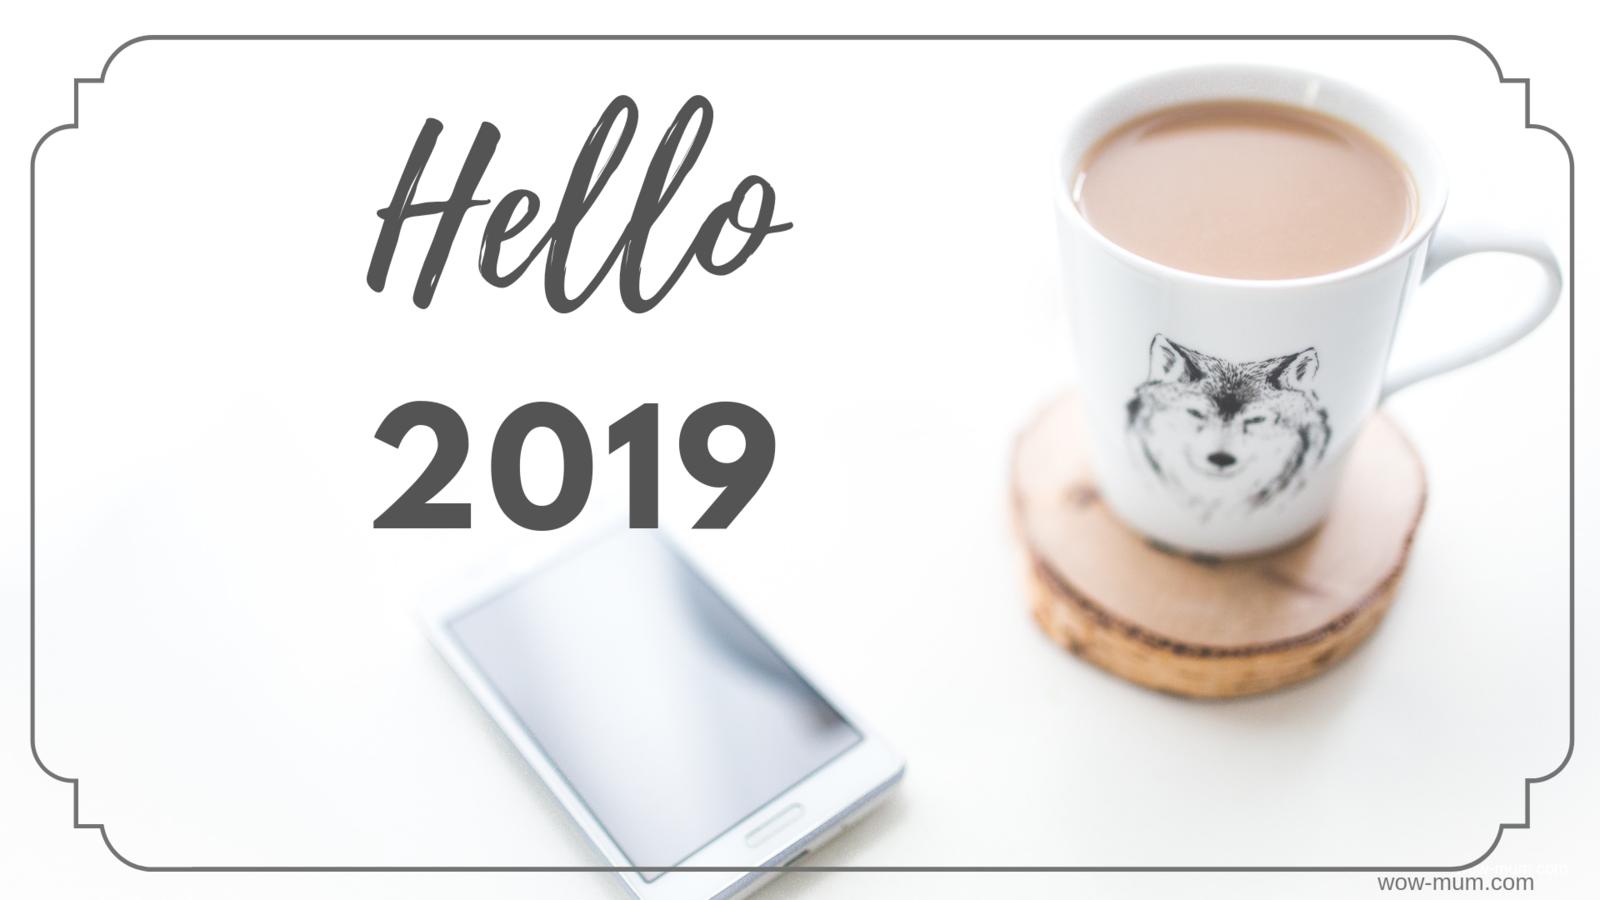 hello-2019-wallpaper-desktop